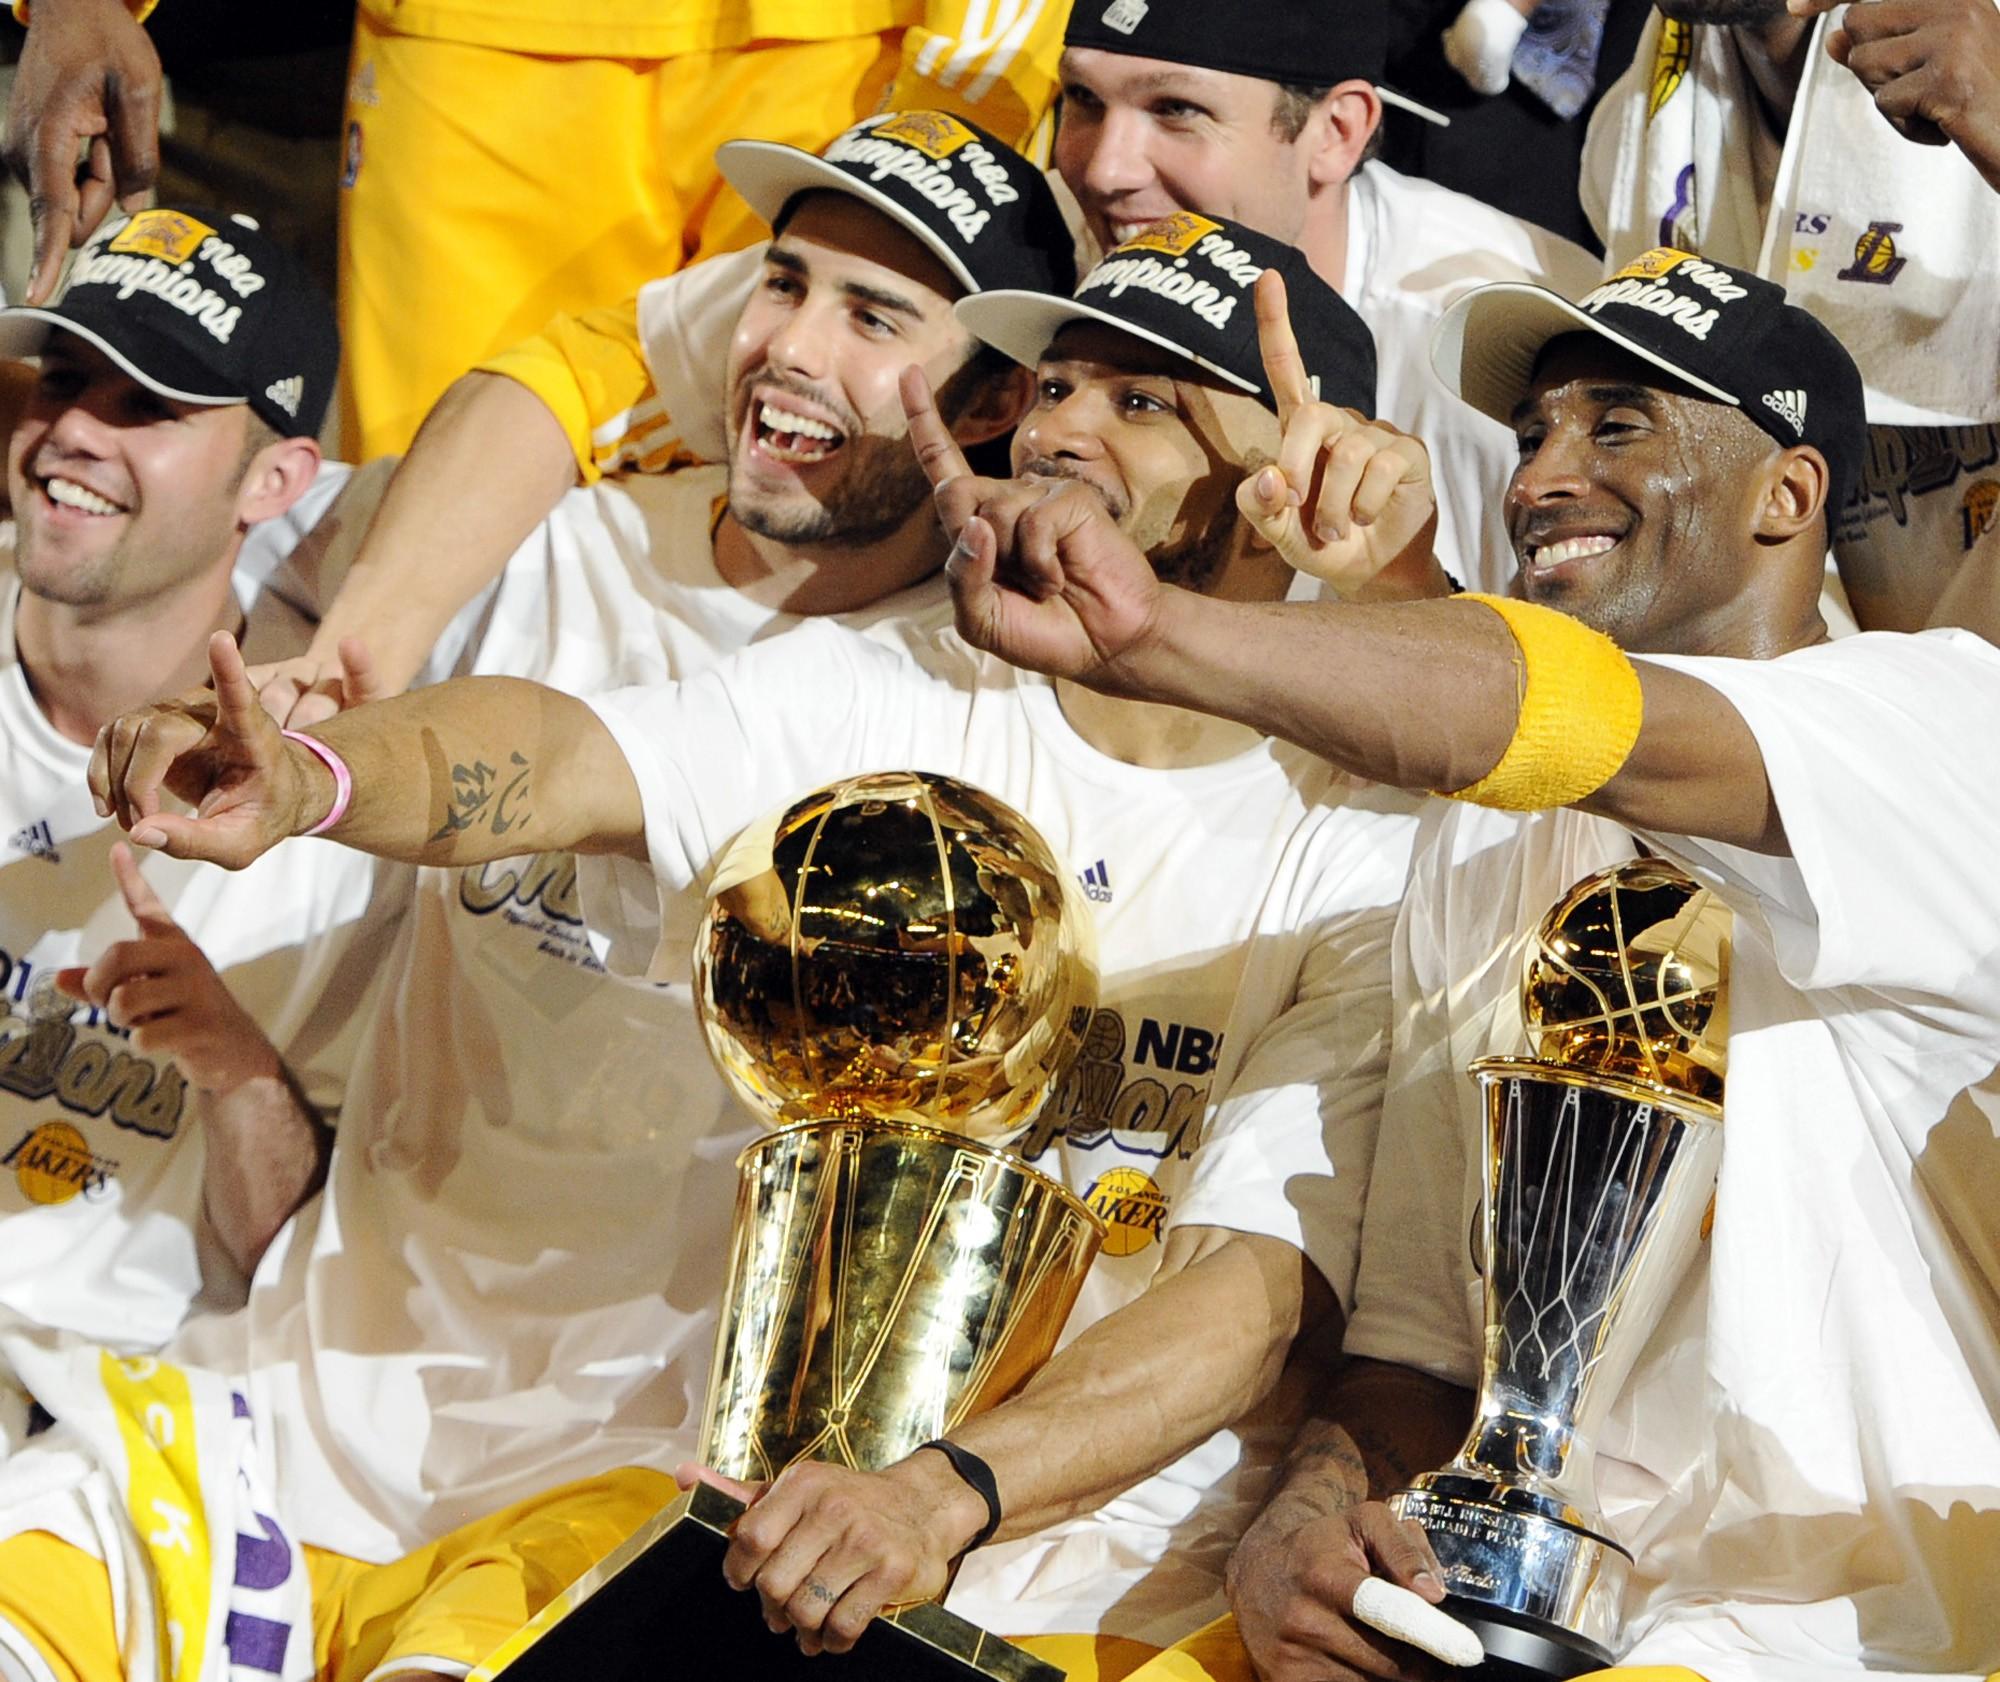 2010 Los Angeles Lakers